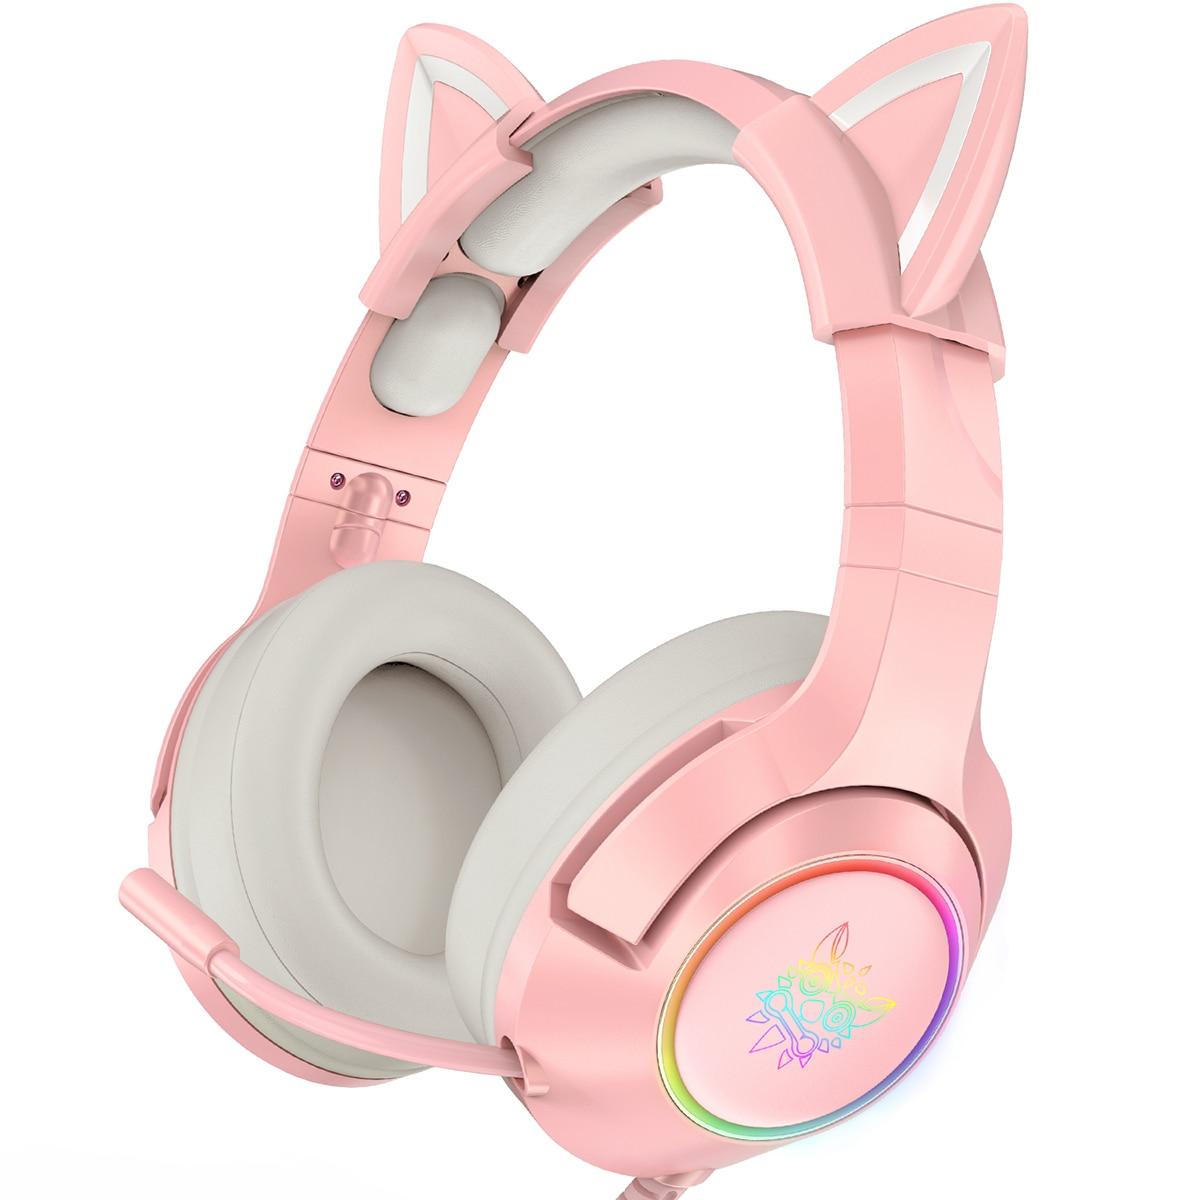 K9 سماعة الألعاب LED الوردي آذان القط رئيس شنت السلكية RGB مضيئة 7.1 ستيريو للإزالة الحد من الضوضاء سماعة مع ميكروفون